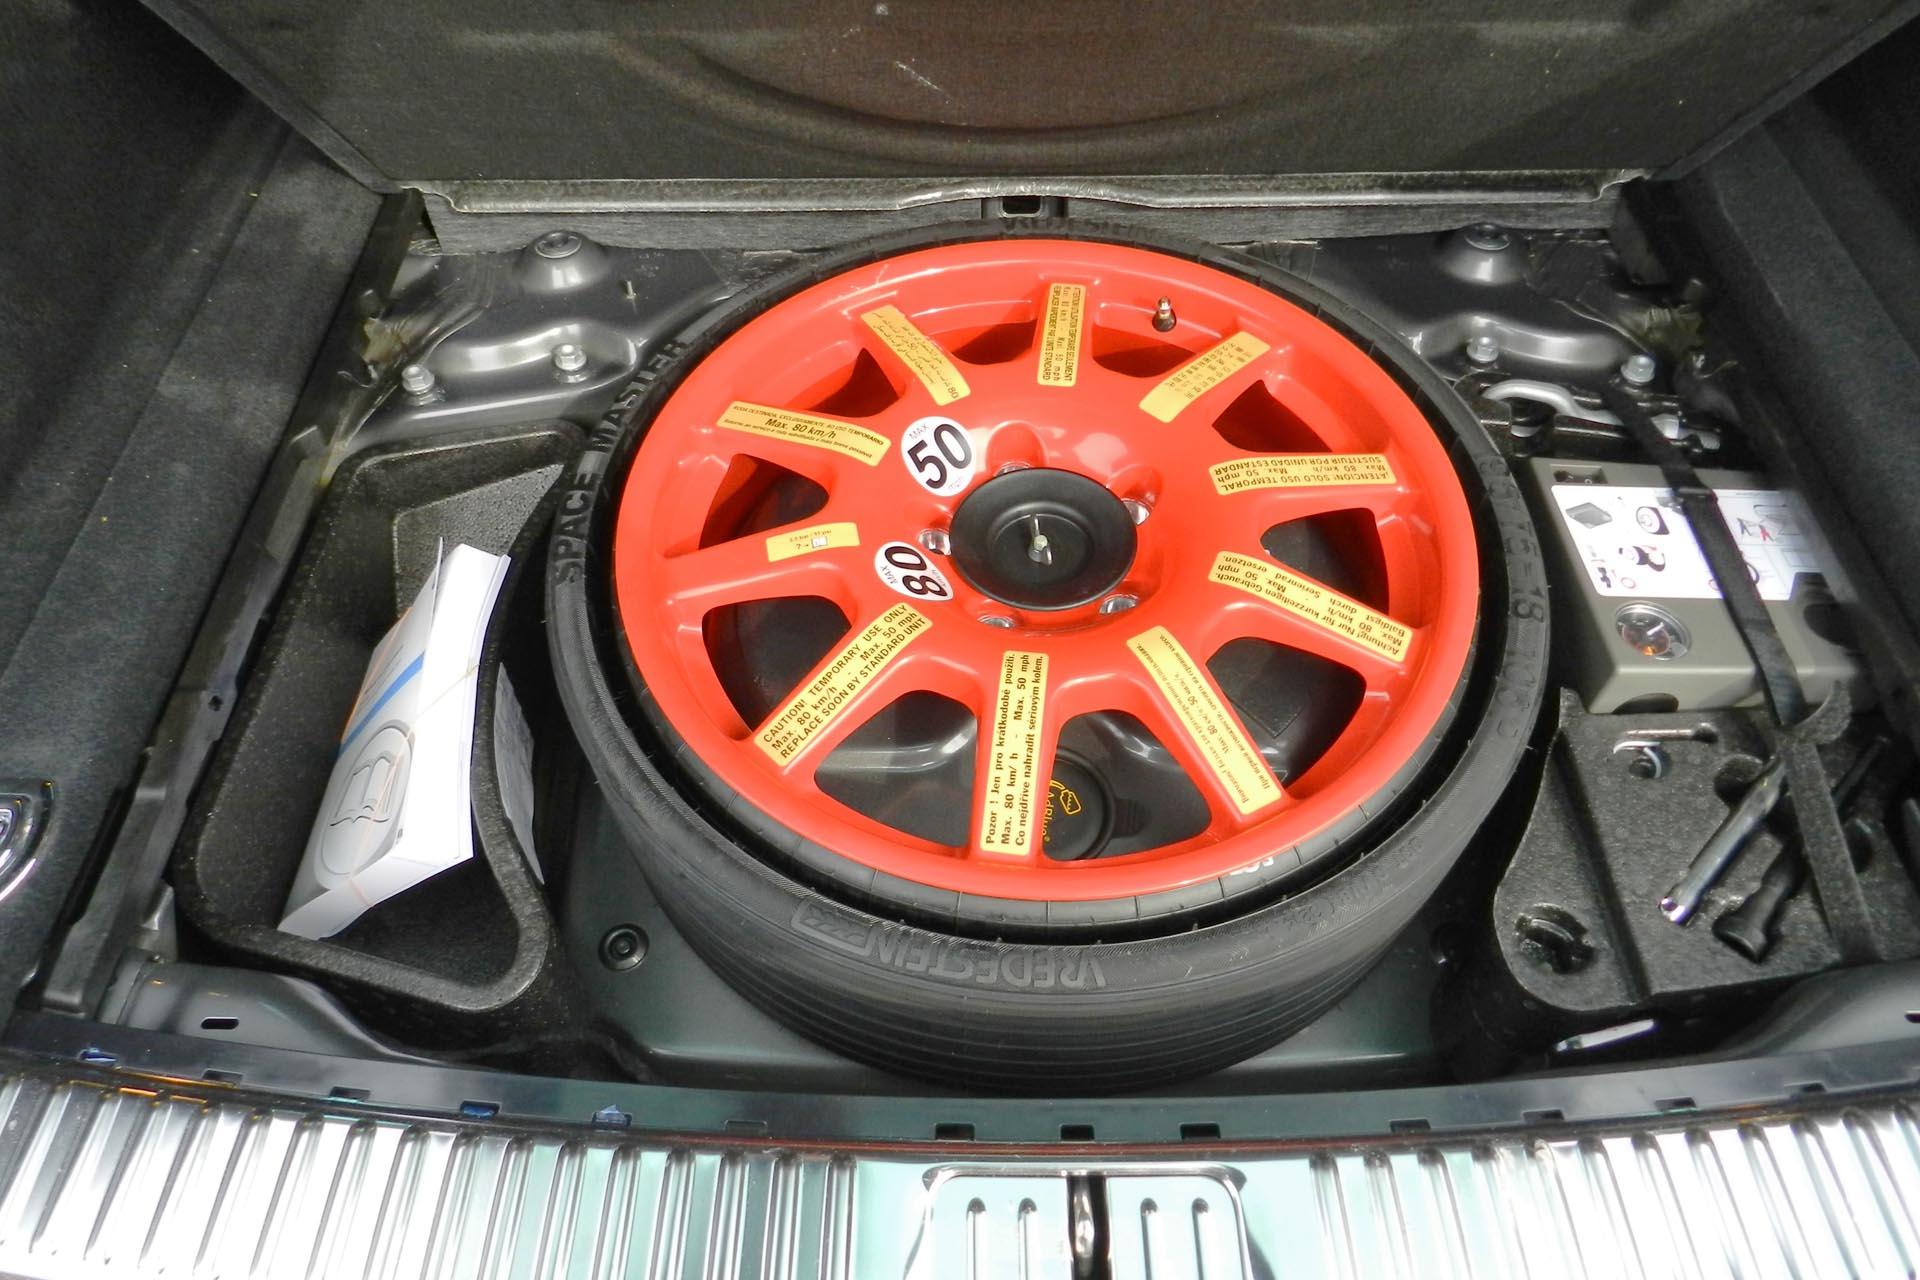 2015 Volkswagen Touareg TDI Execline Autosca